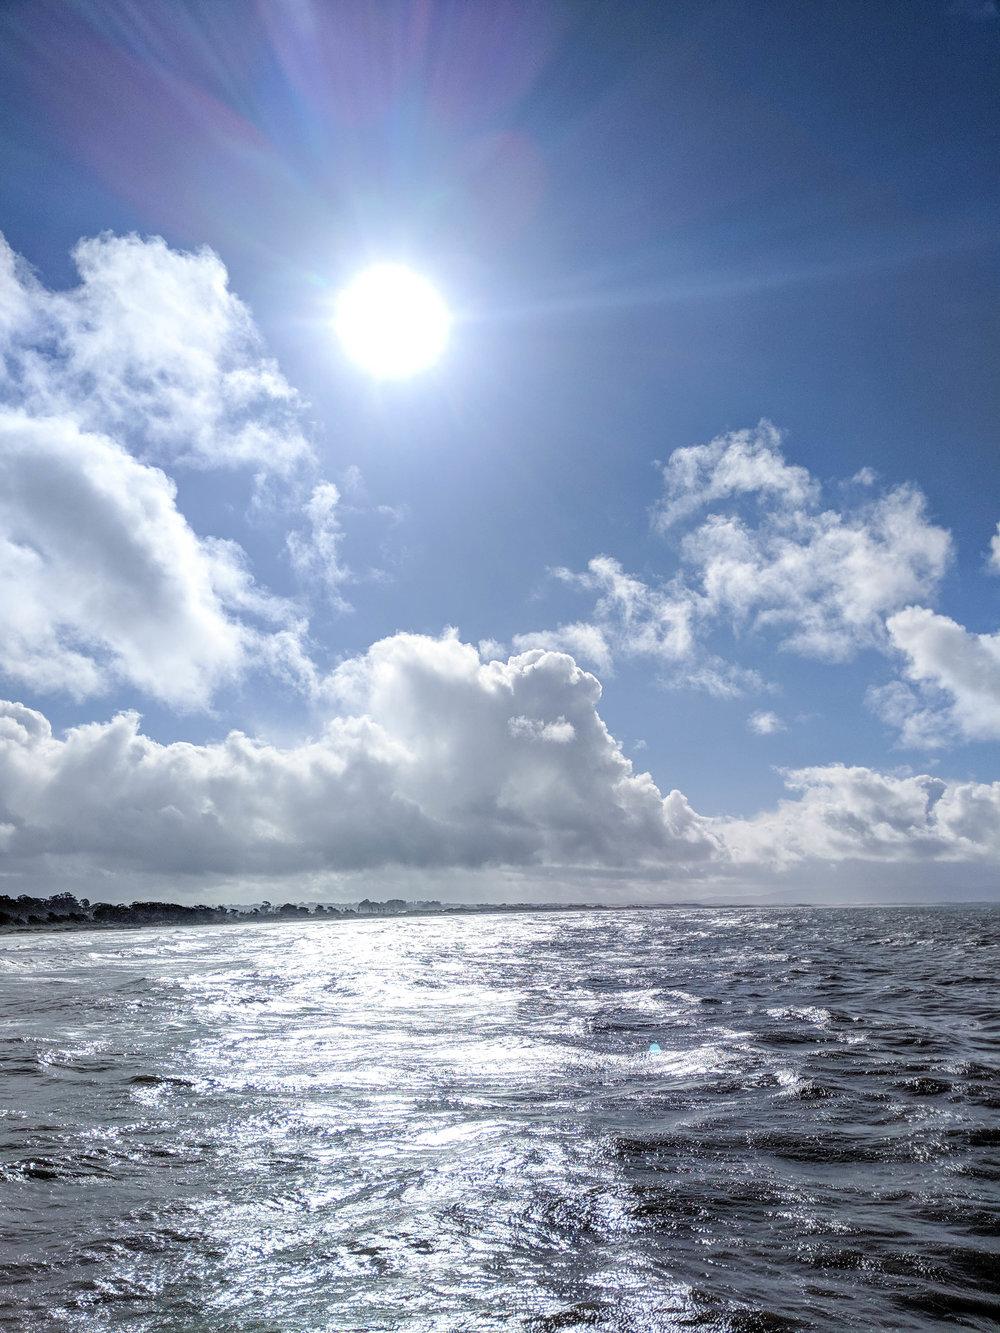 bri rinehart; photography; pismo beach; california; clouds; ocean